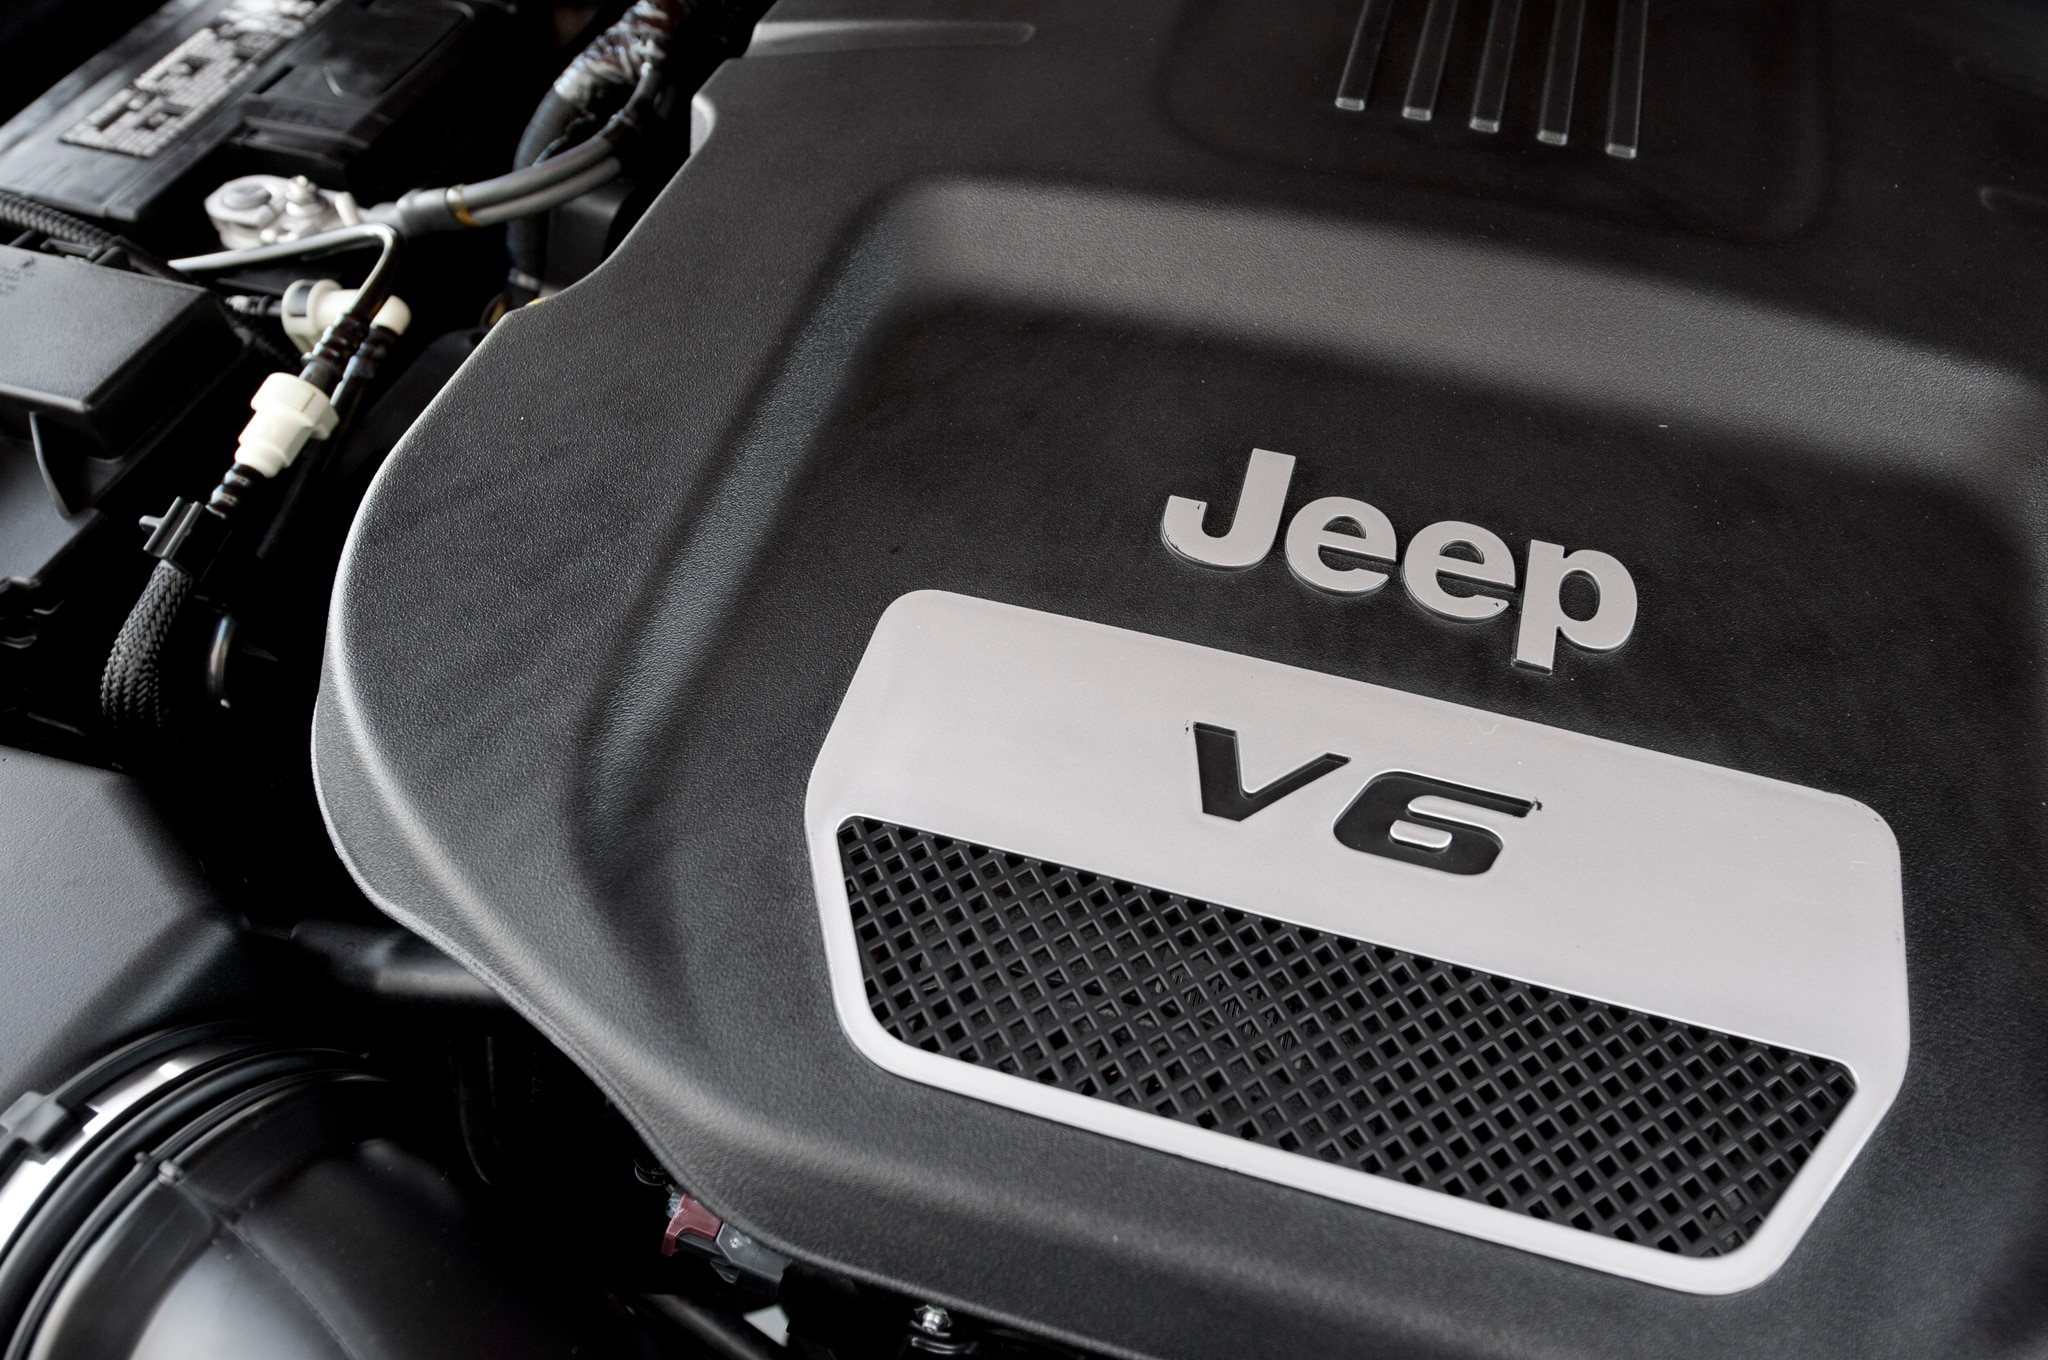 Report 2018 Jeep Wrangler to Use EightSpeed Auto